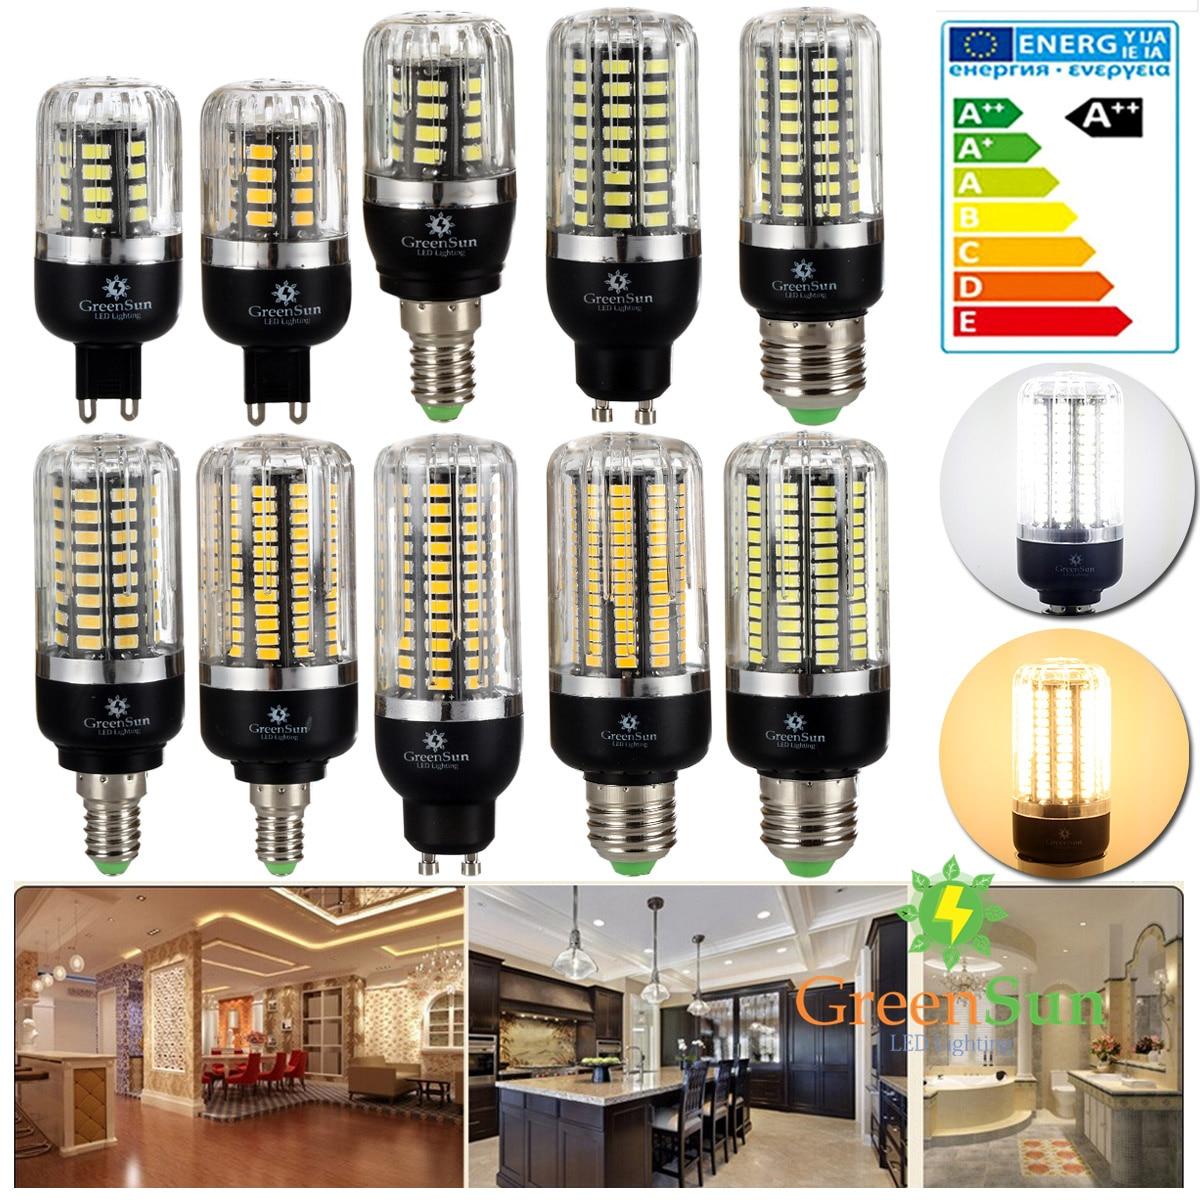 High Lumens 5736 SMD LED Corn Bulb Light E14 E27 G9 GU10 3W 5W 7W 9W 12W 15W LED Spot Light Lamp 220V Energy Saving 2pcs real full watt 3w 5w 7w 8w 12w 15w e27 e14 led corn bulb 85v 265v smd 5736 led lamp spot light 28 40 72 108 132 156 leds